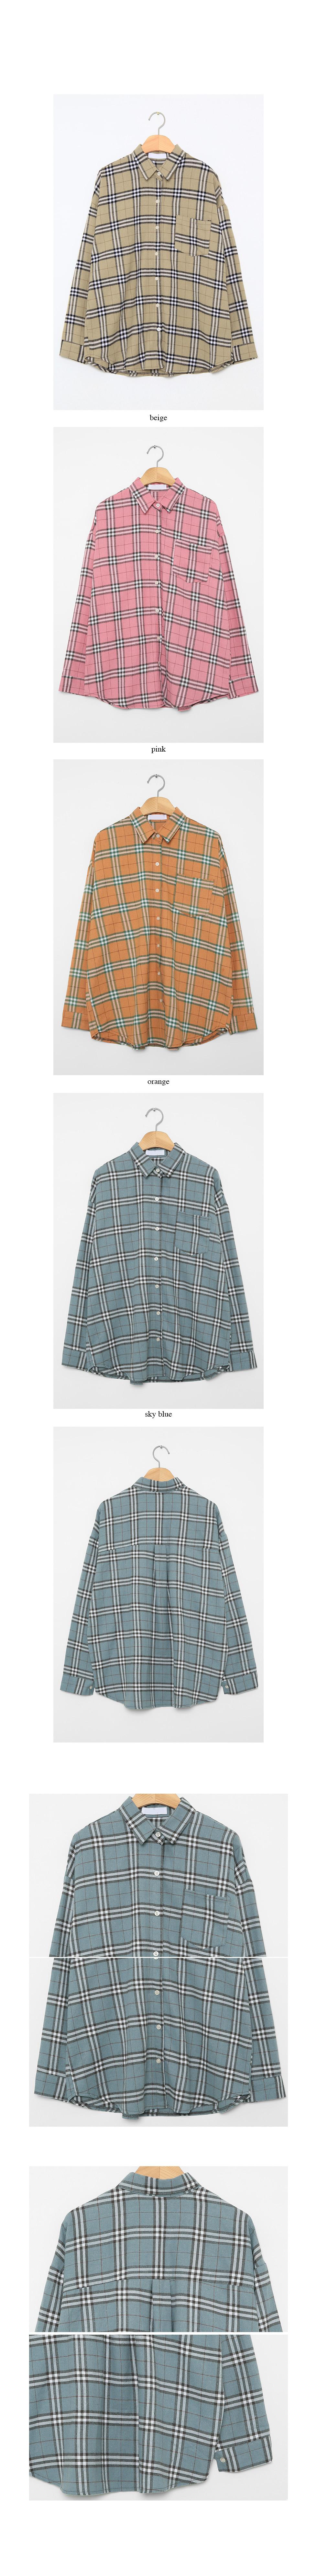 retro check basic shirts